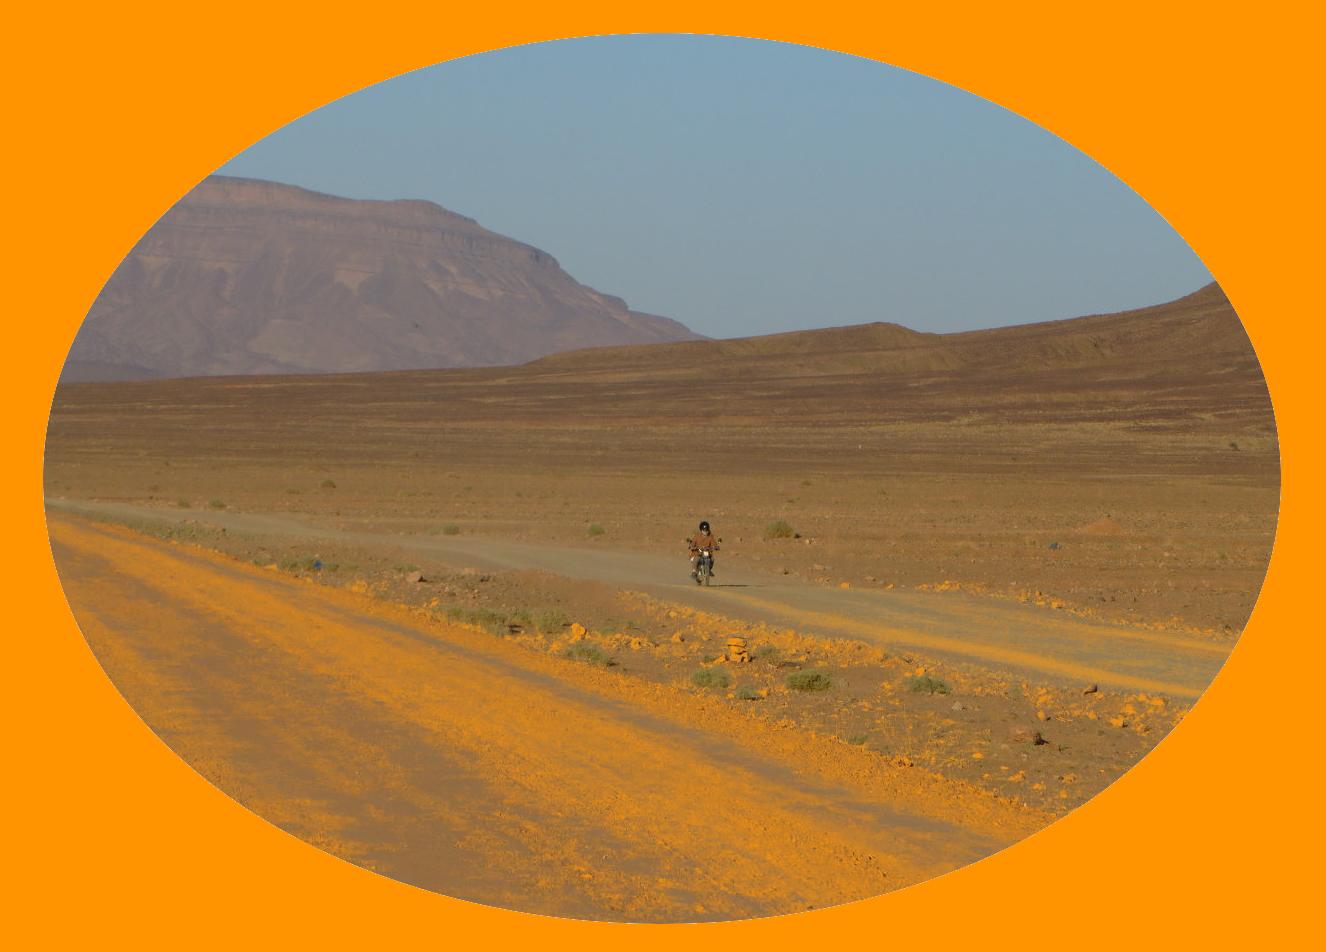 Wüstenfoto Marokko by Petra Gerhards